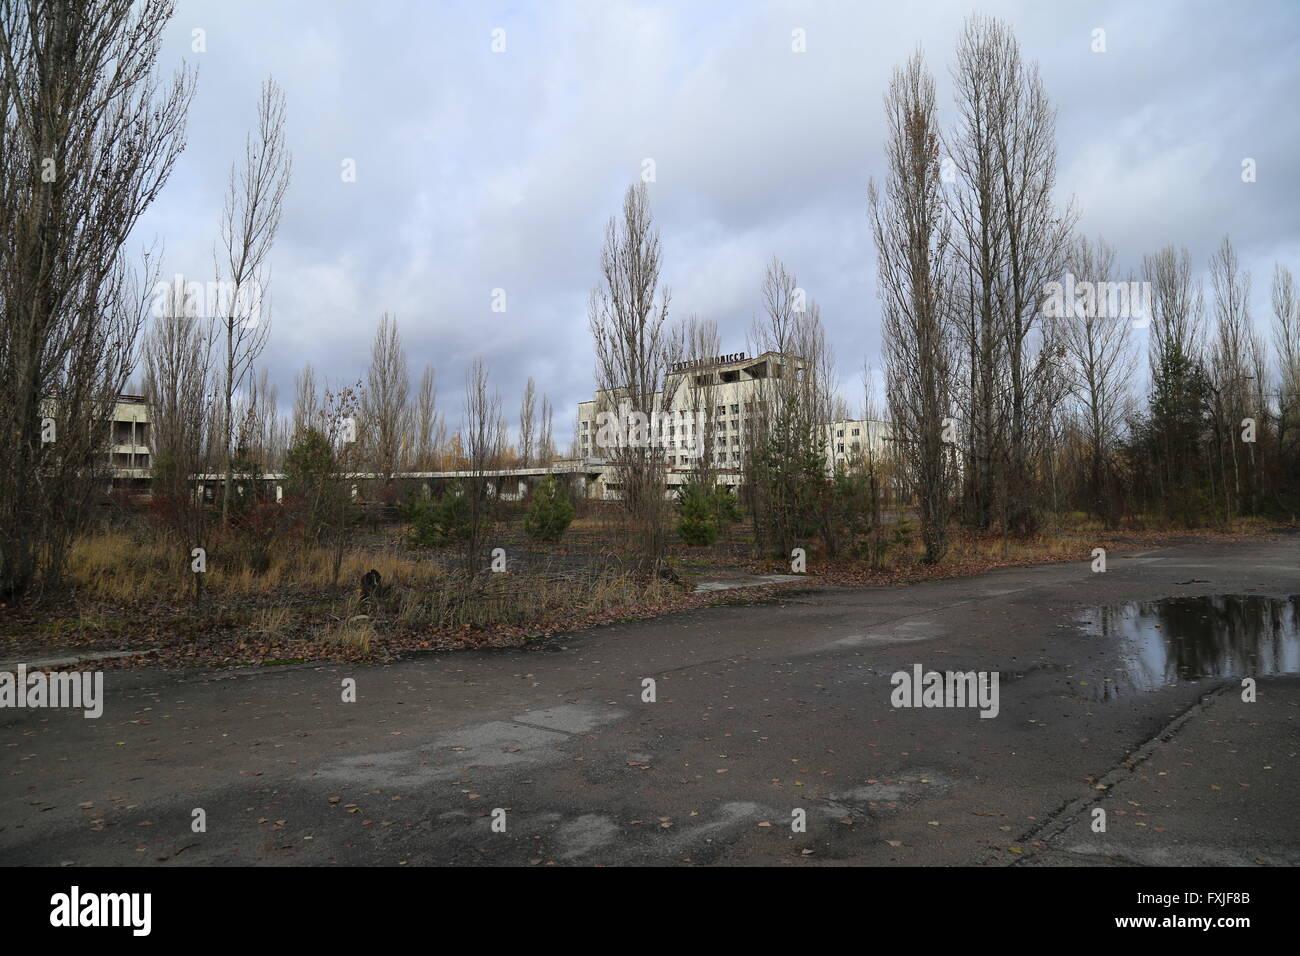 The abandoned city of Pripyat, Chernobyl Exclusion Zone, Ukraine - Stock Image